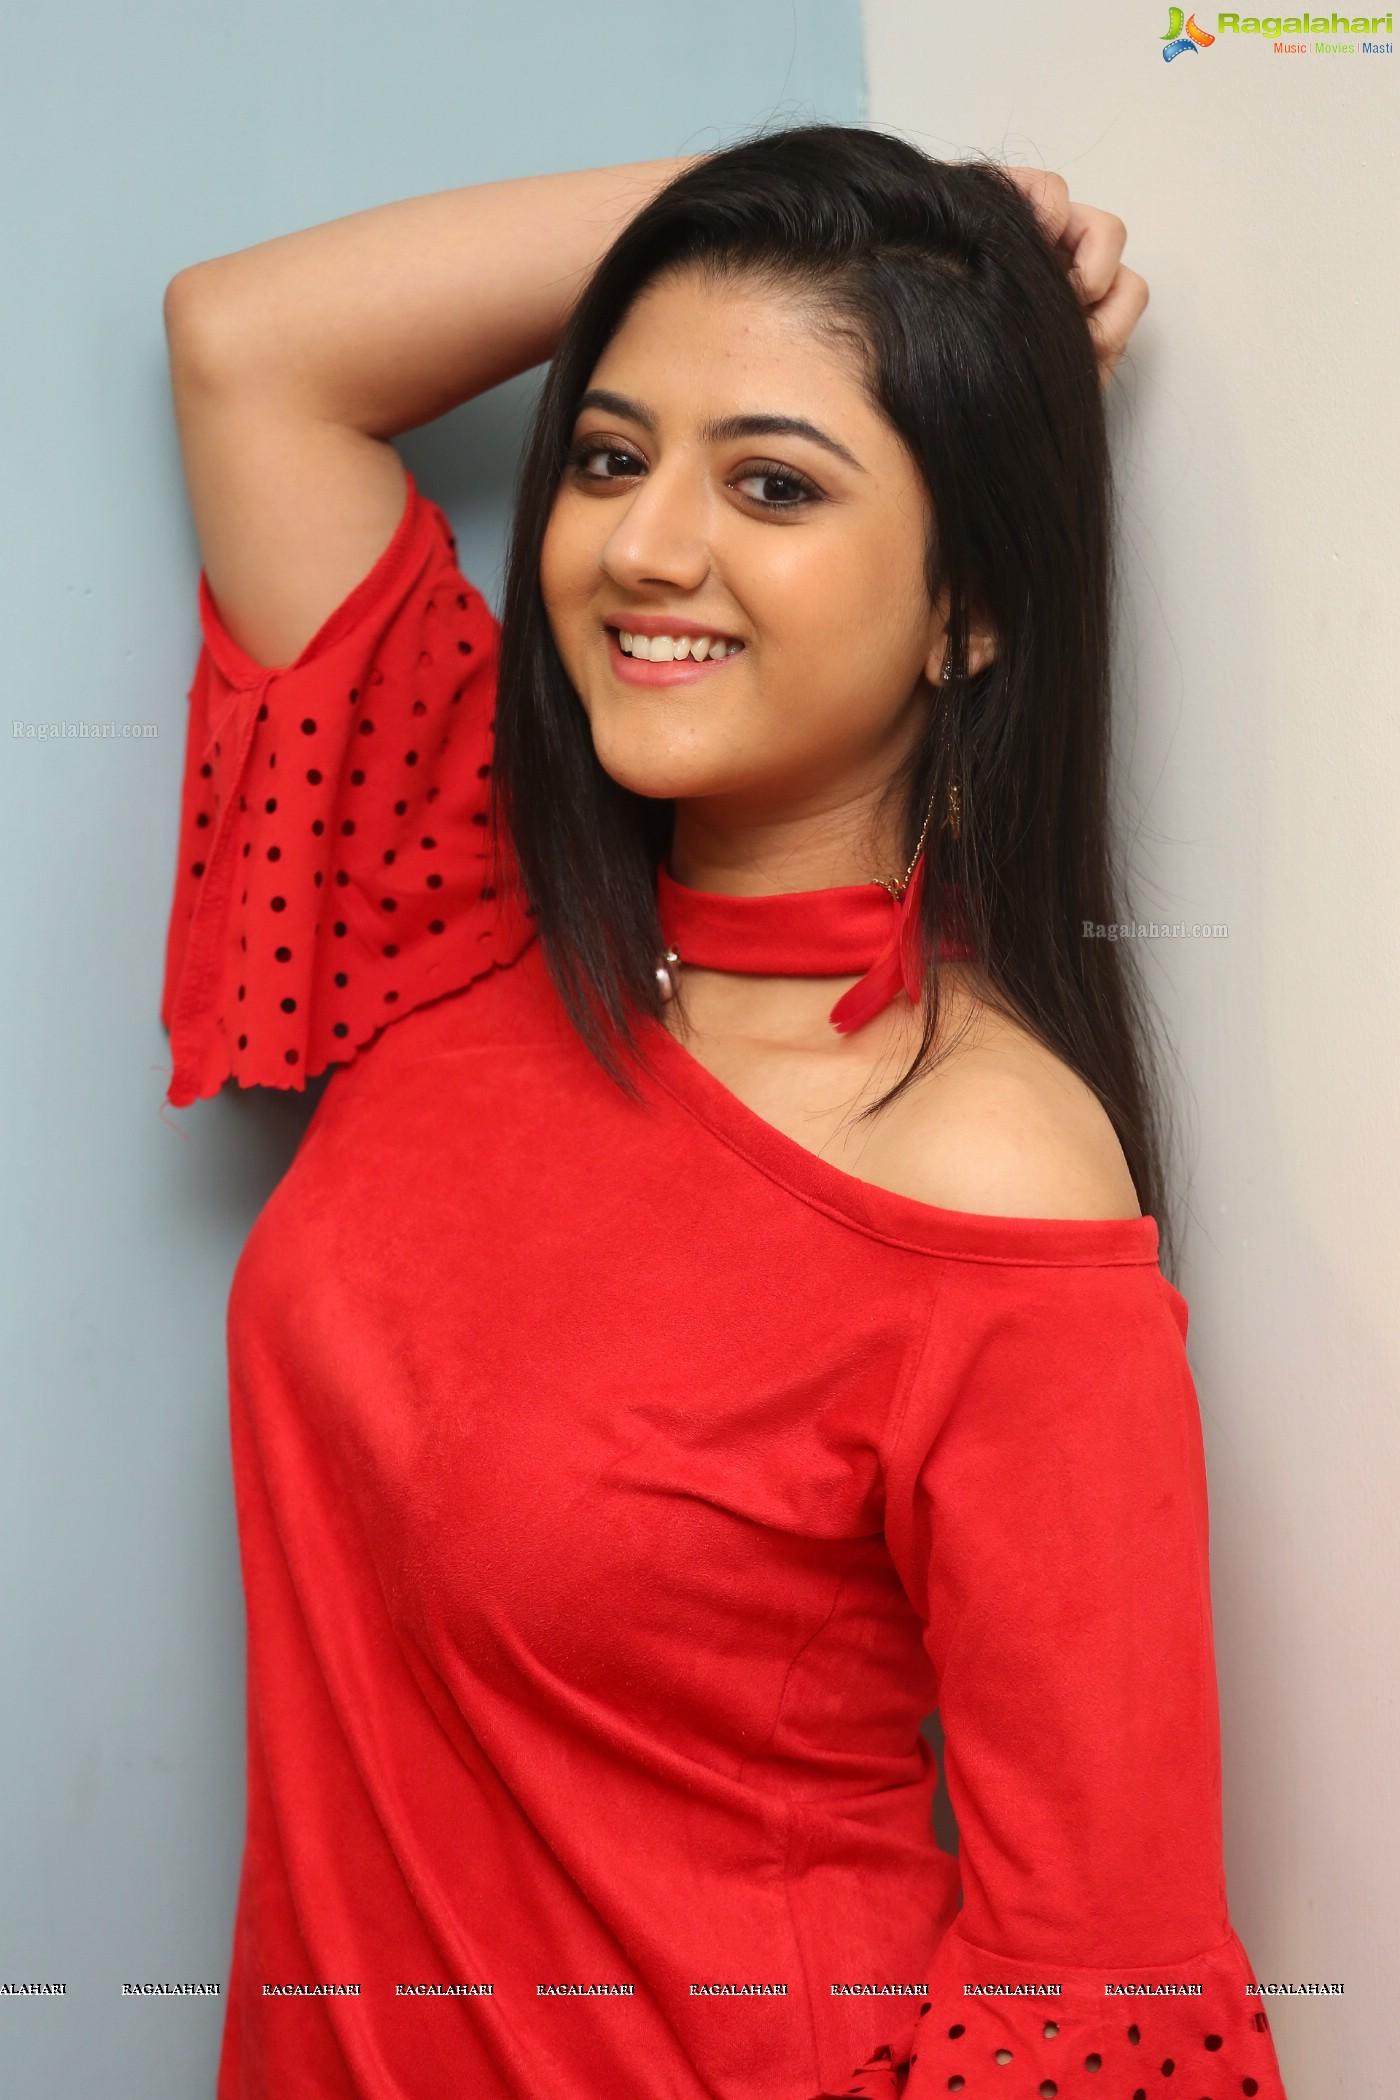 Shriya Sharma nude photos 2019